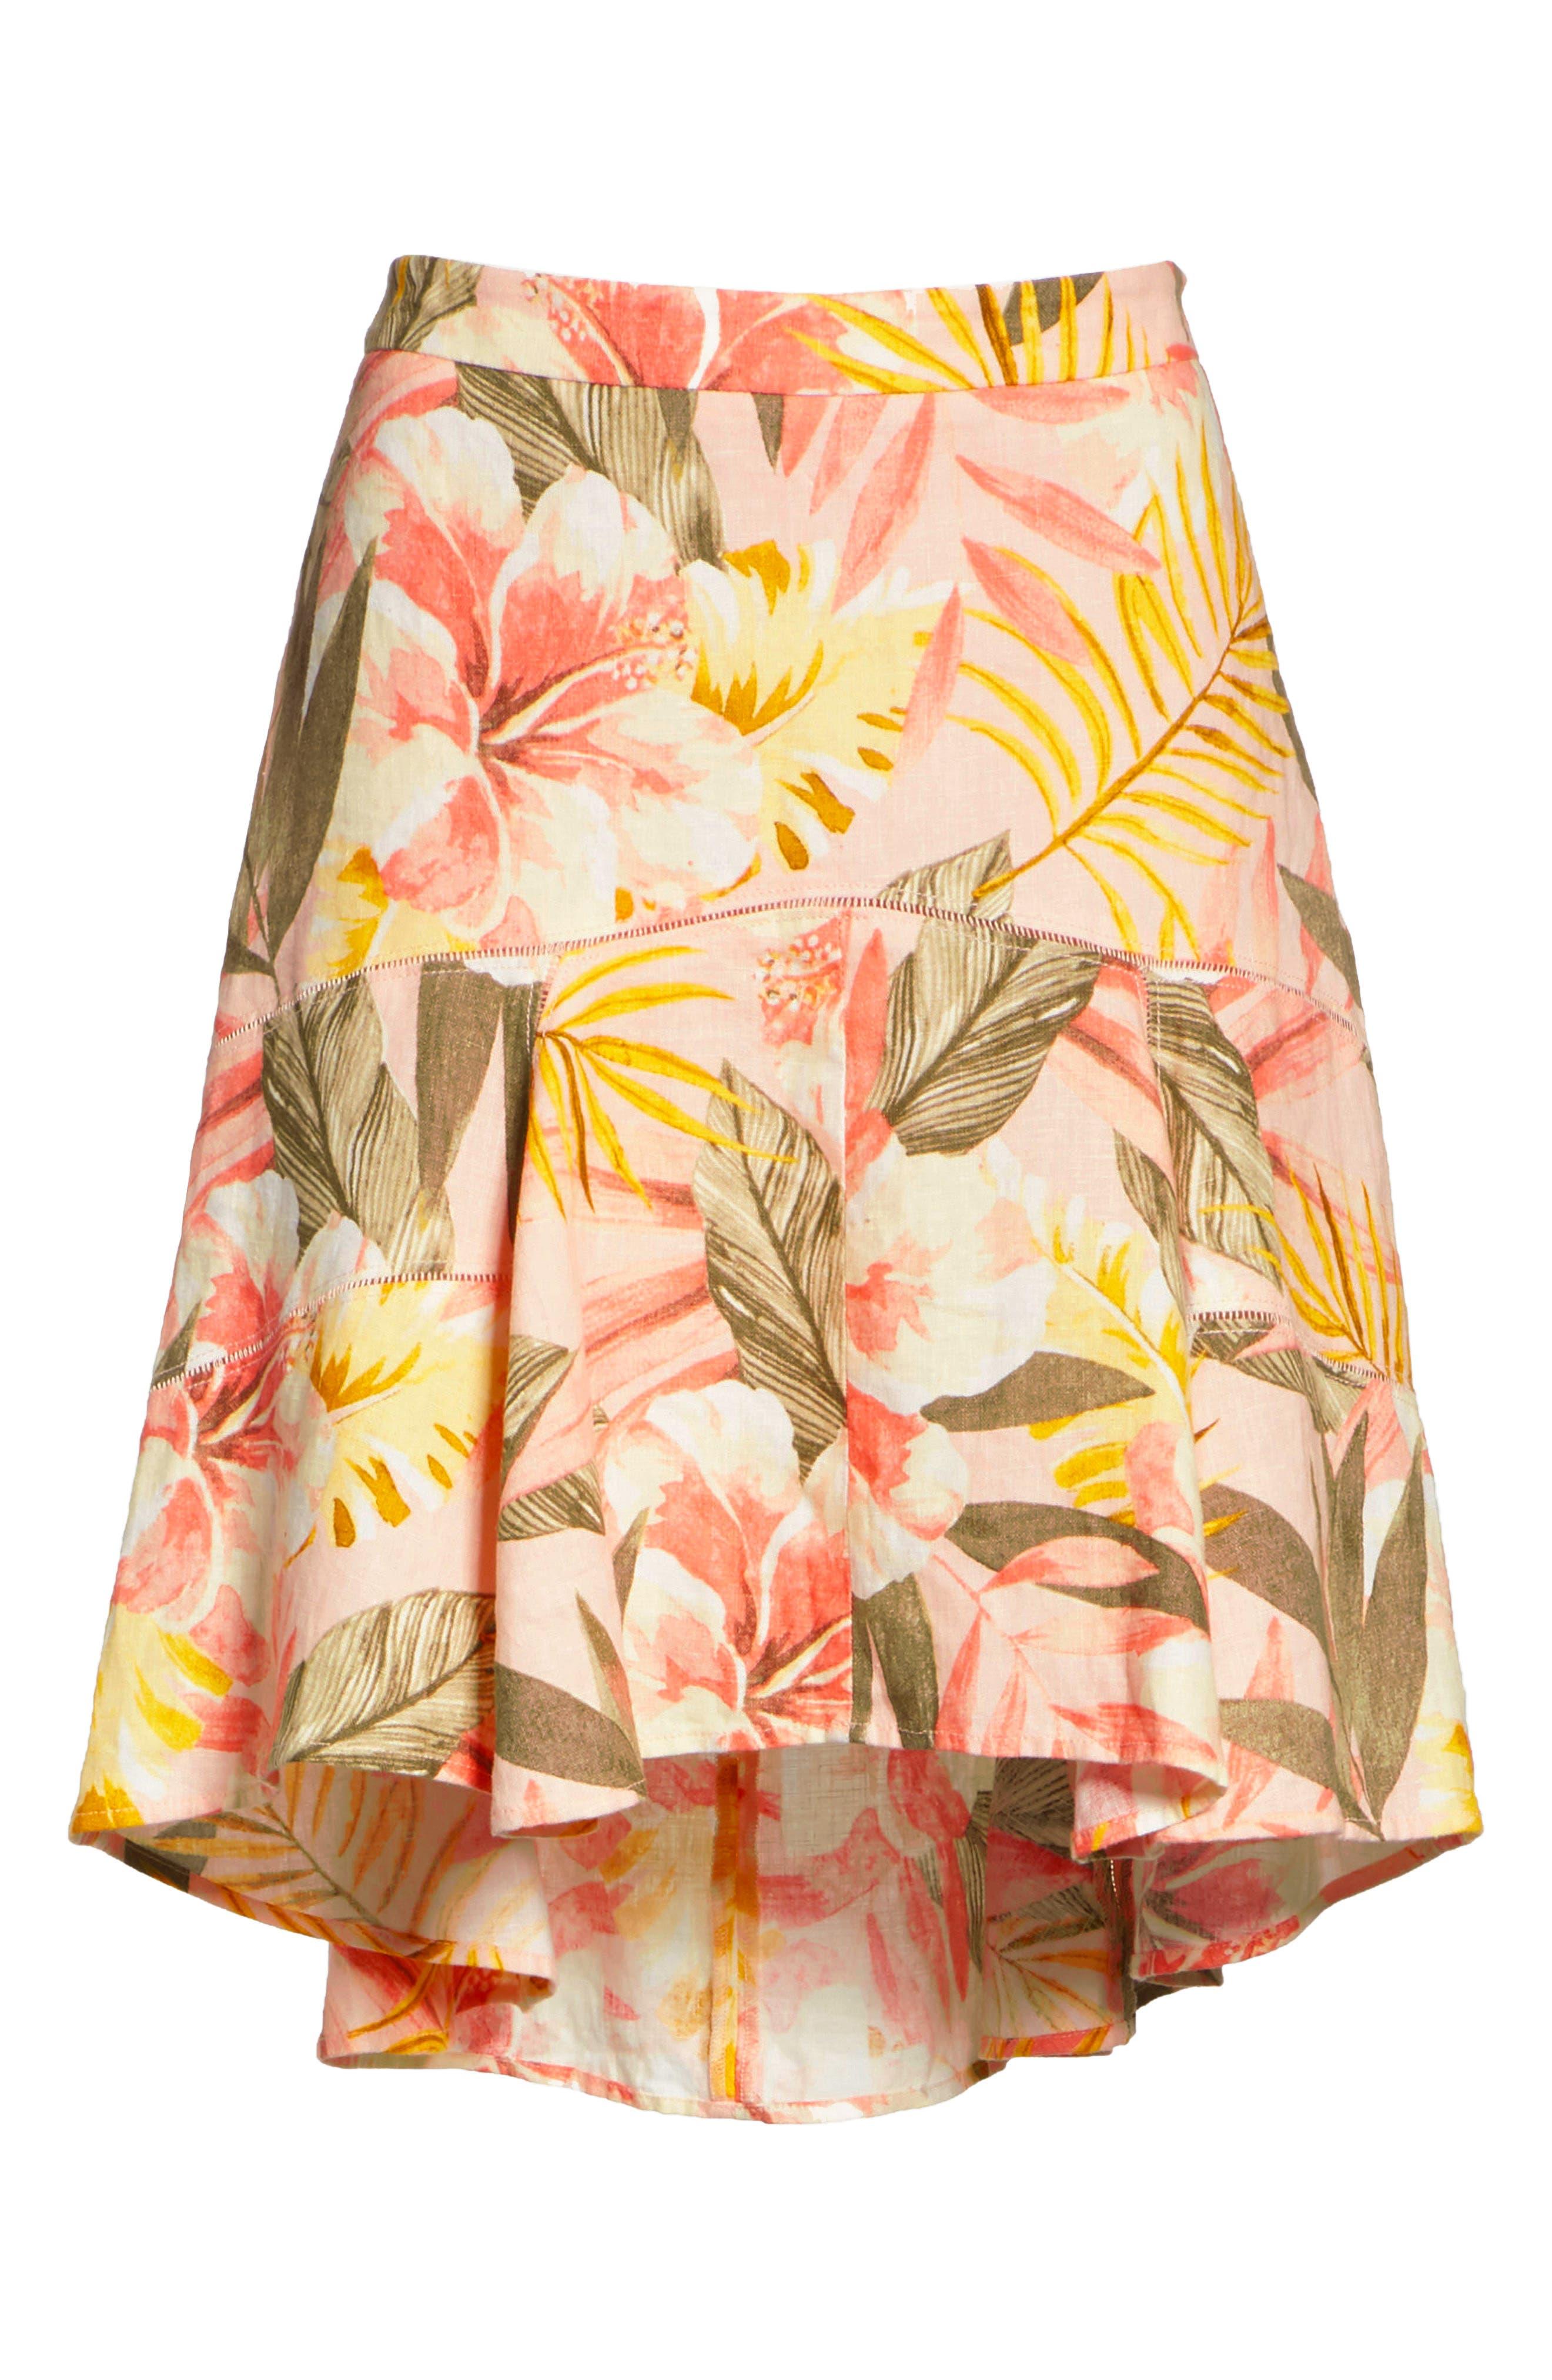 Radhiya Linen Floral Ruffle Skirt,                             Alternate thumbnail 6, color,                             660